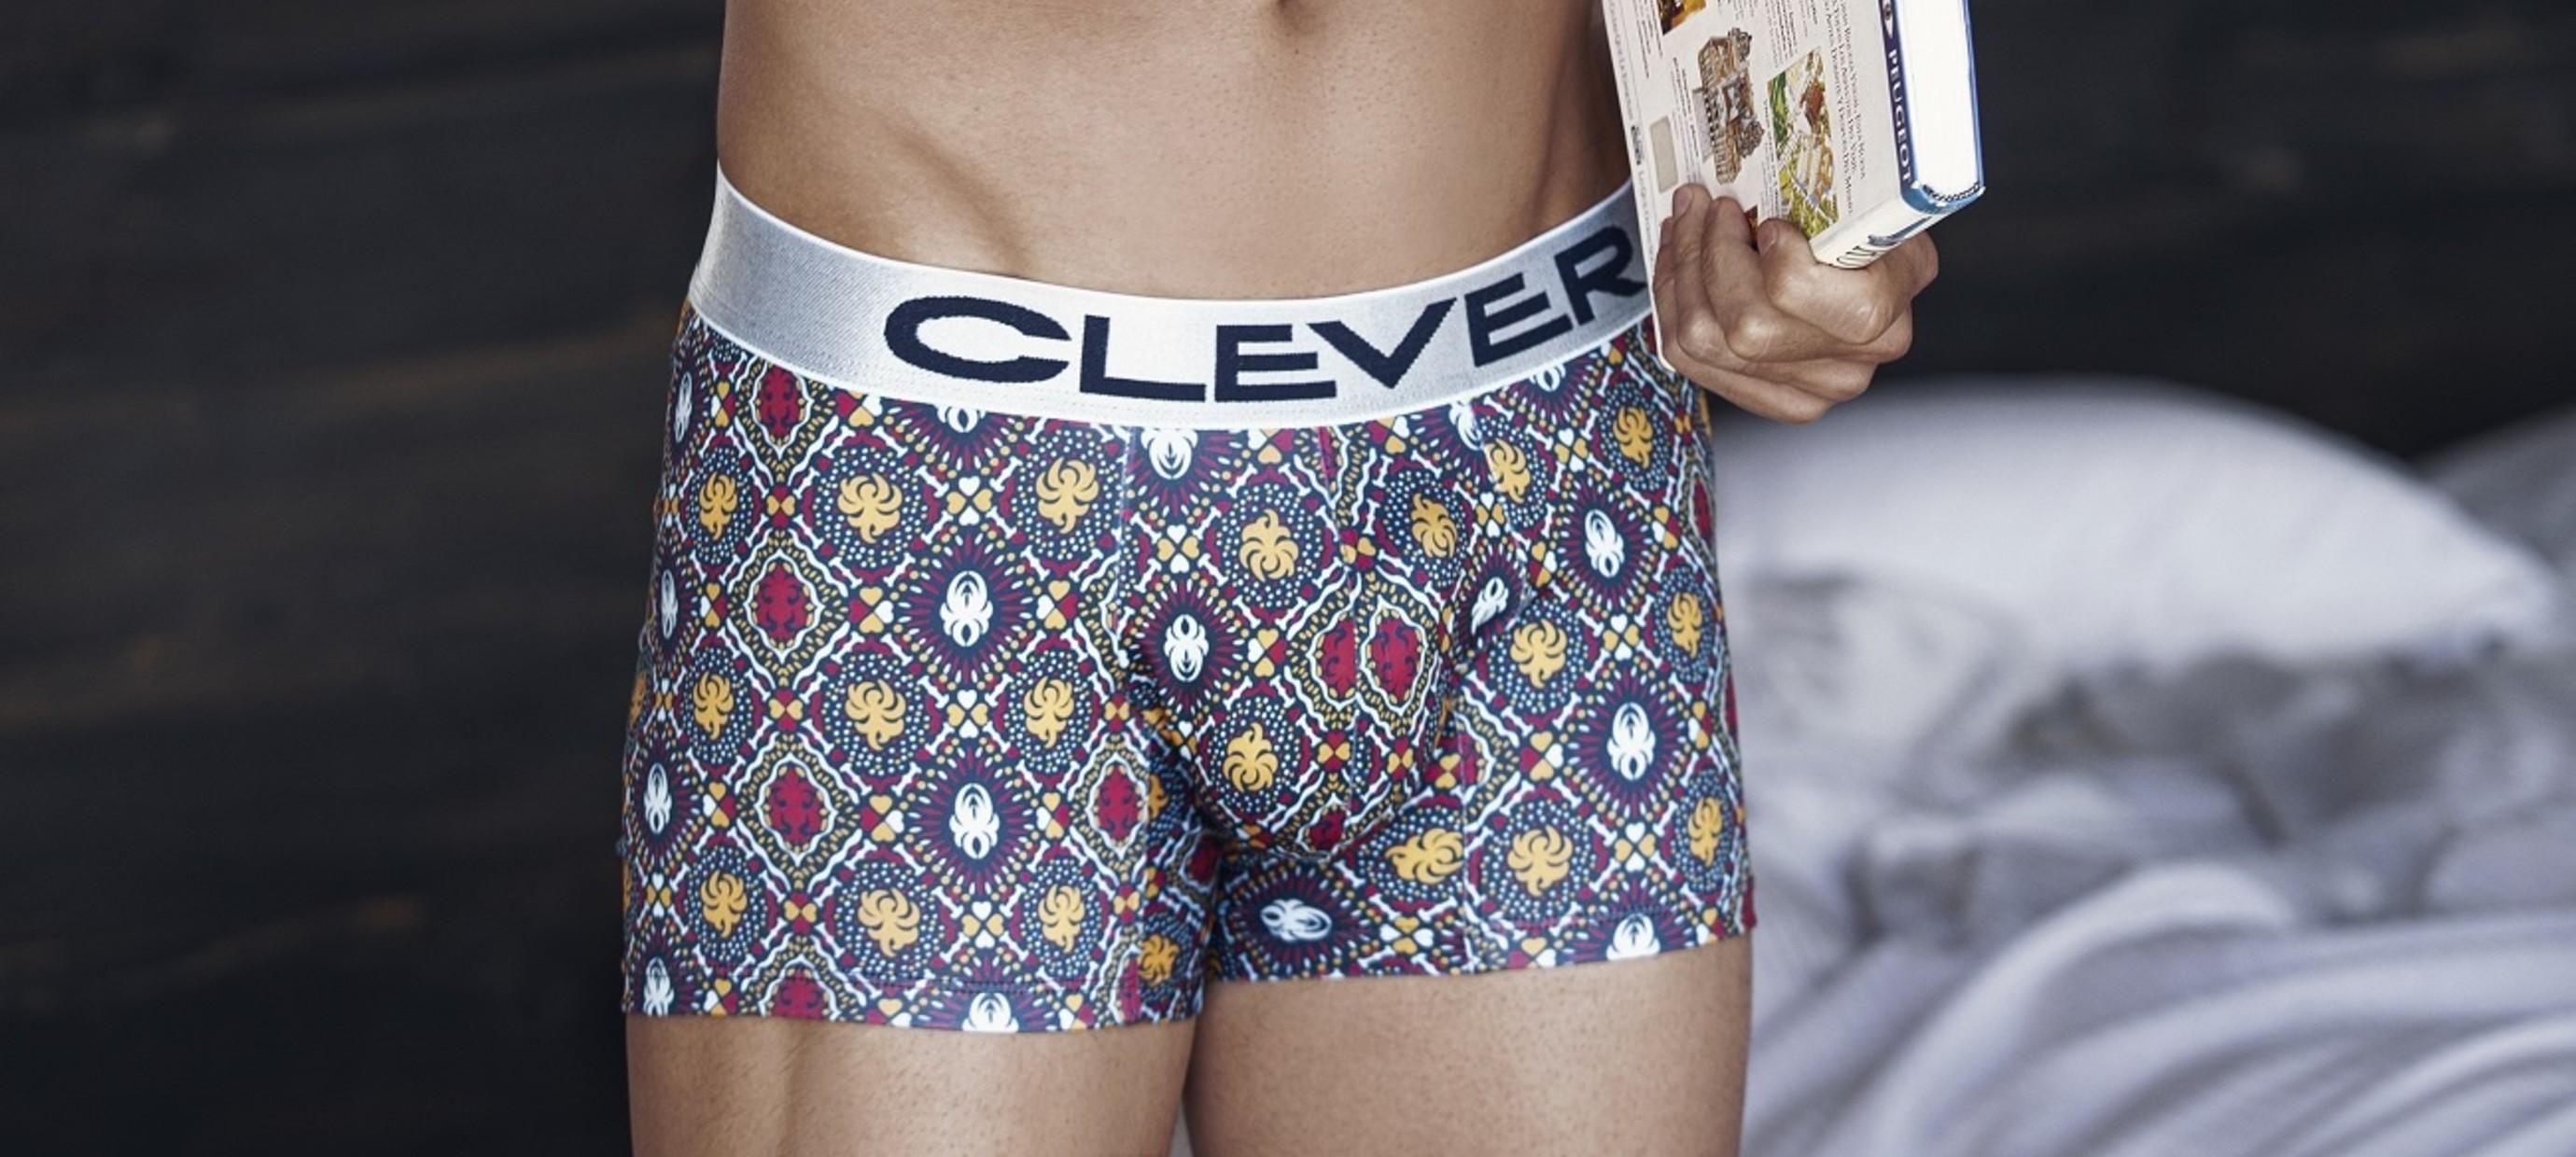 Clever ondergoed